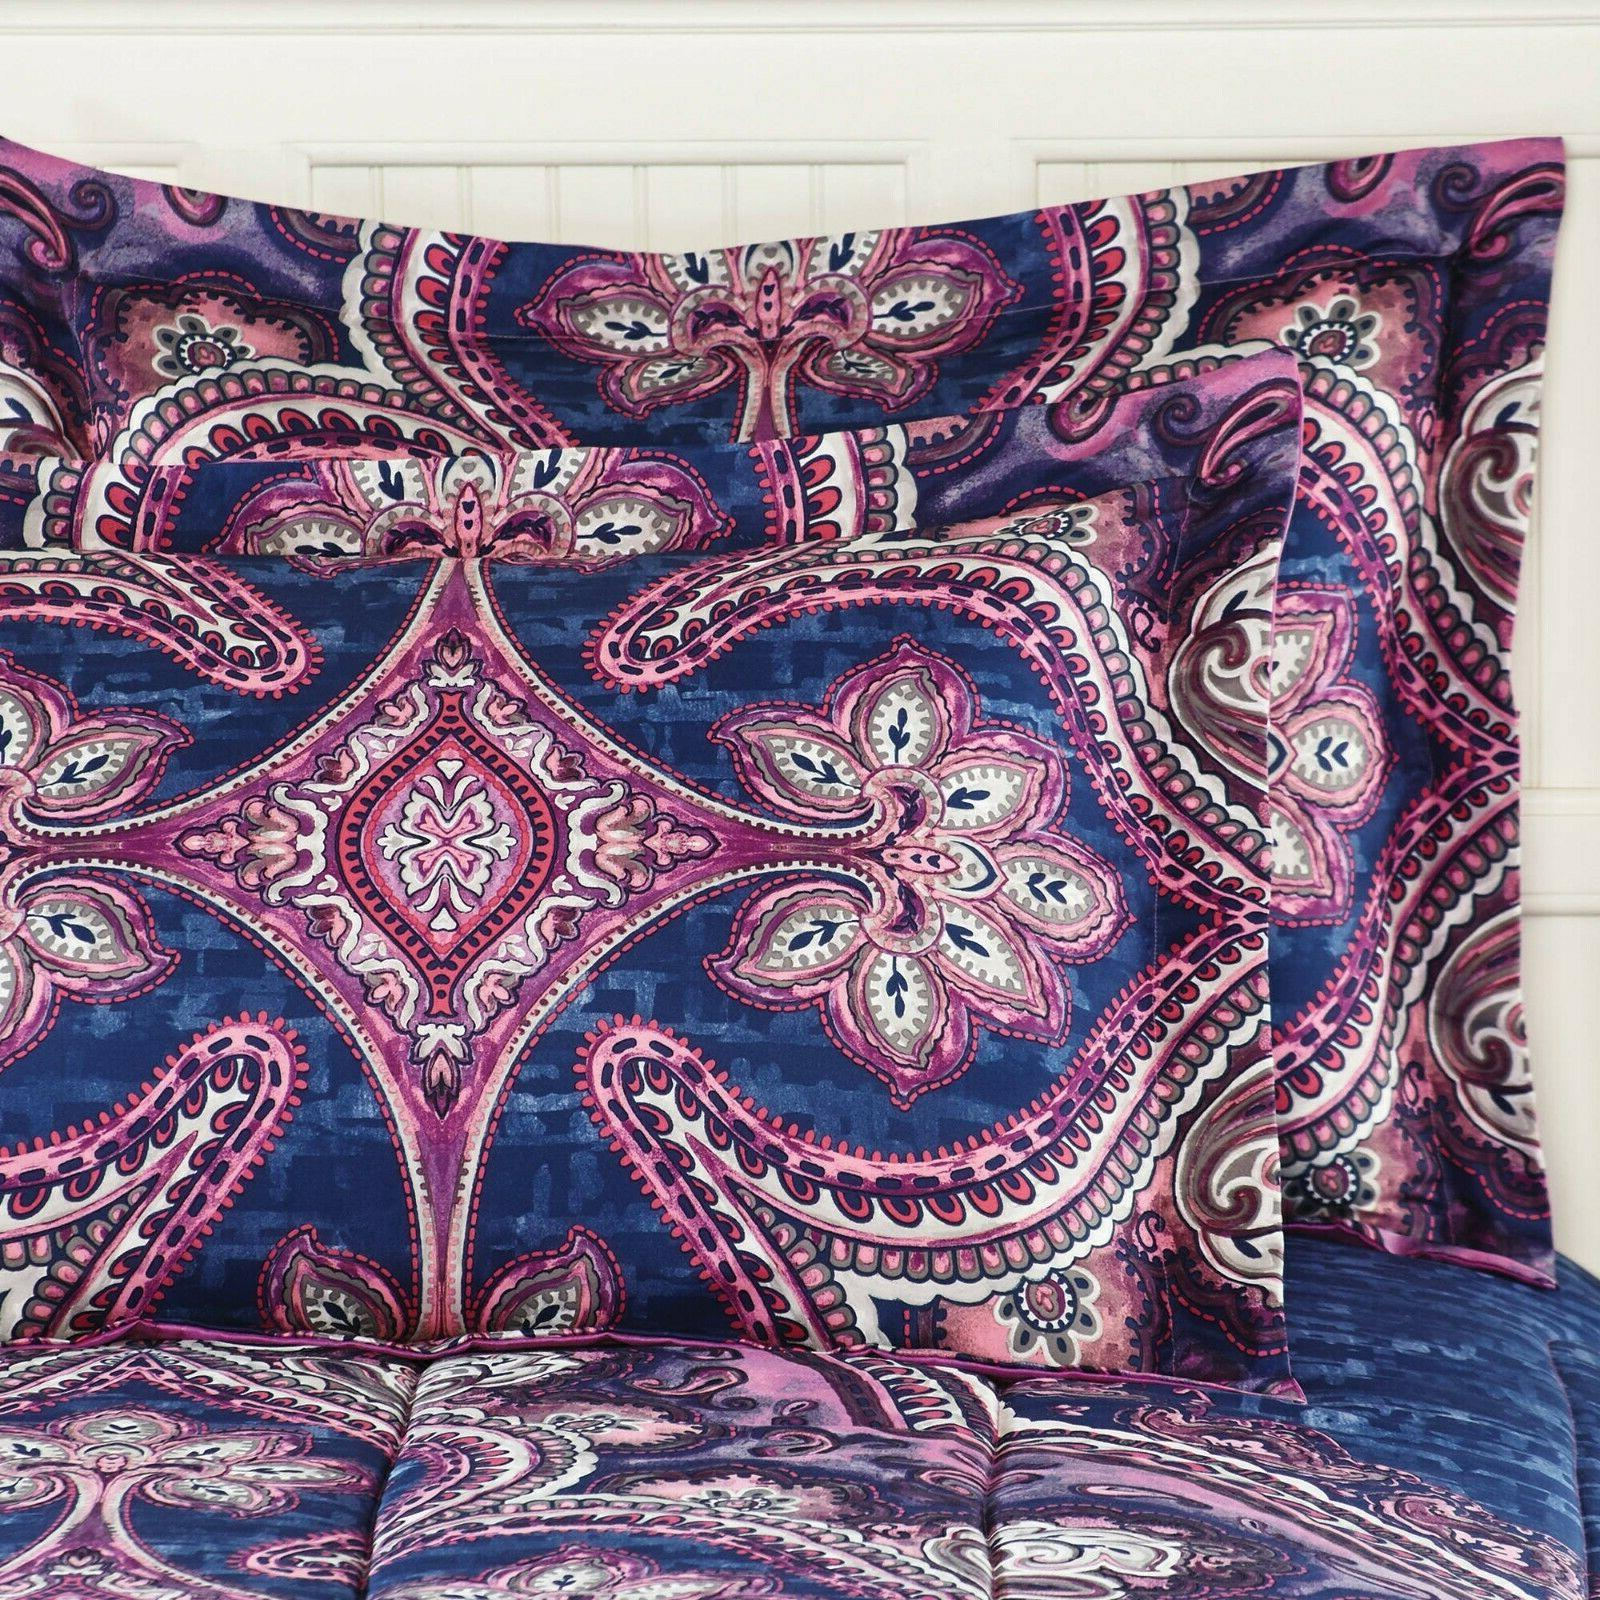 King Size Girls Set Comforter Sheets 8 Purple